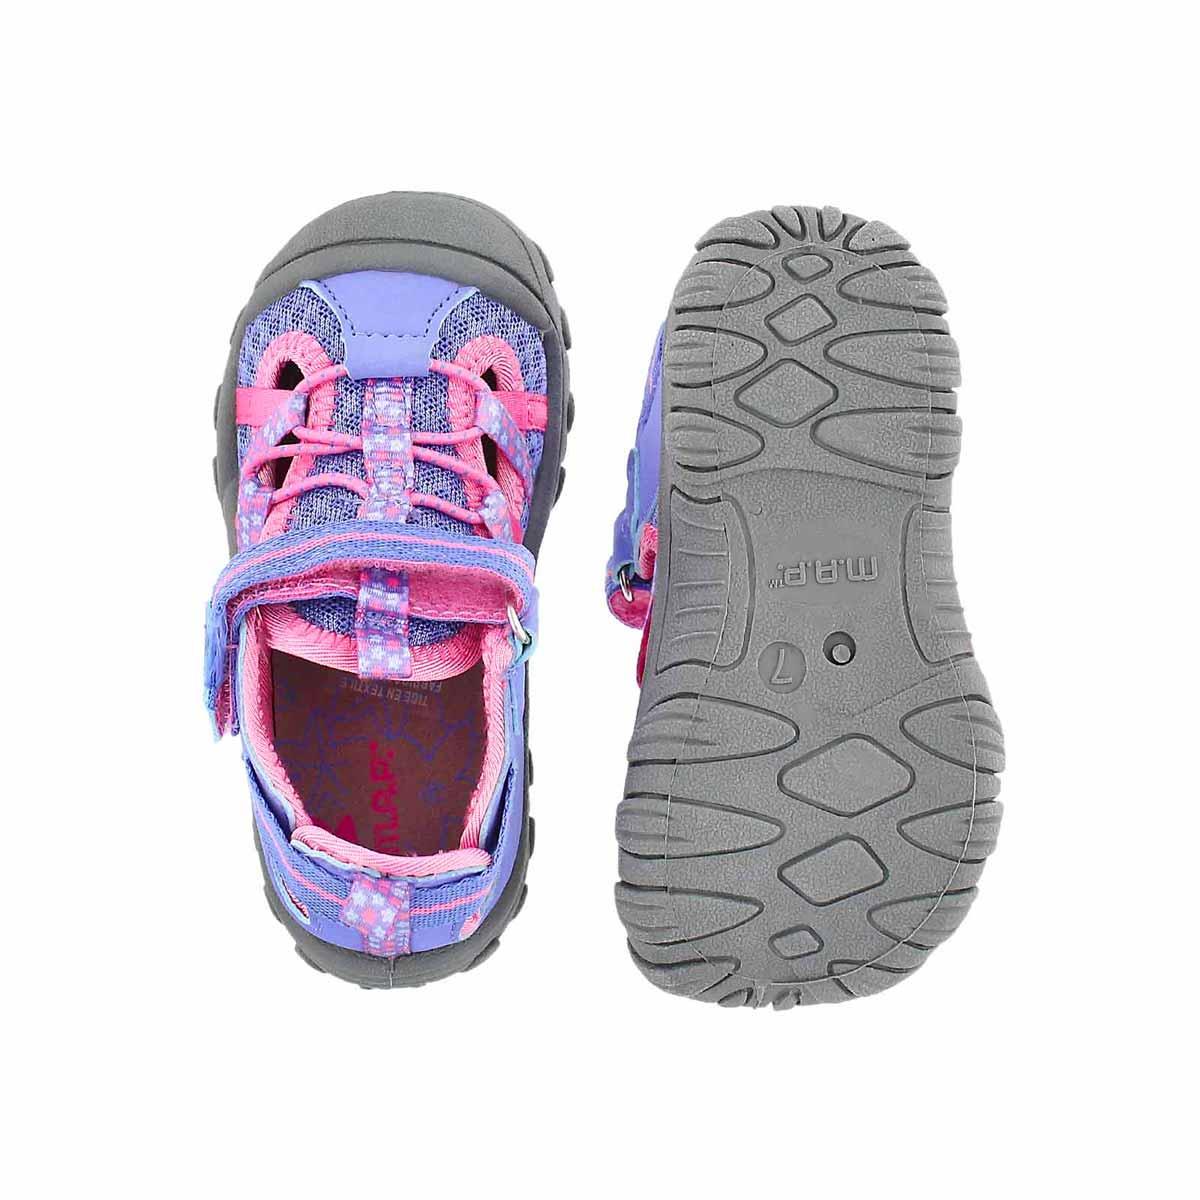 Sandale p�cheur NIAGARA, pervenche, b�b�